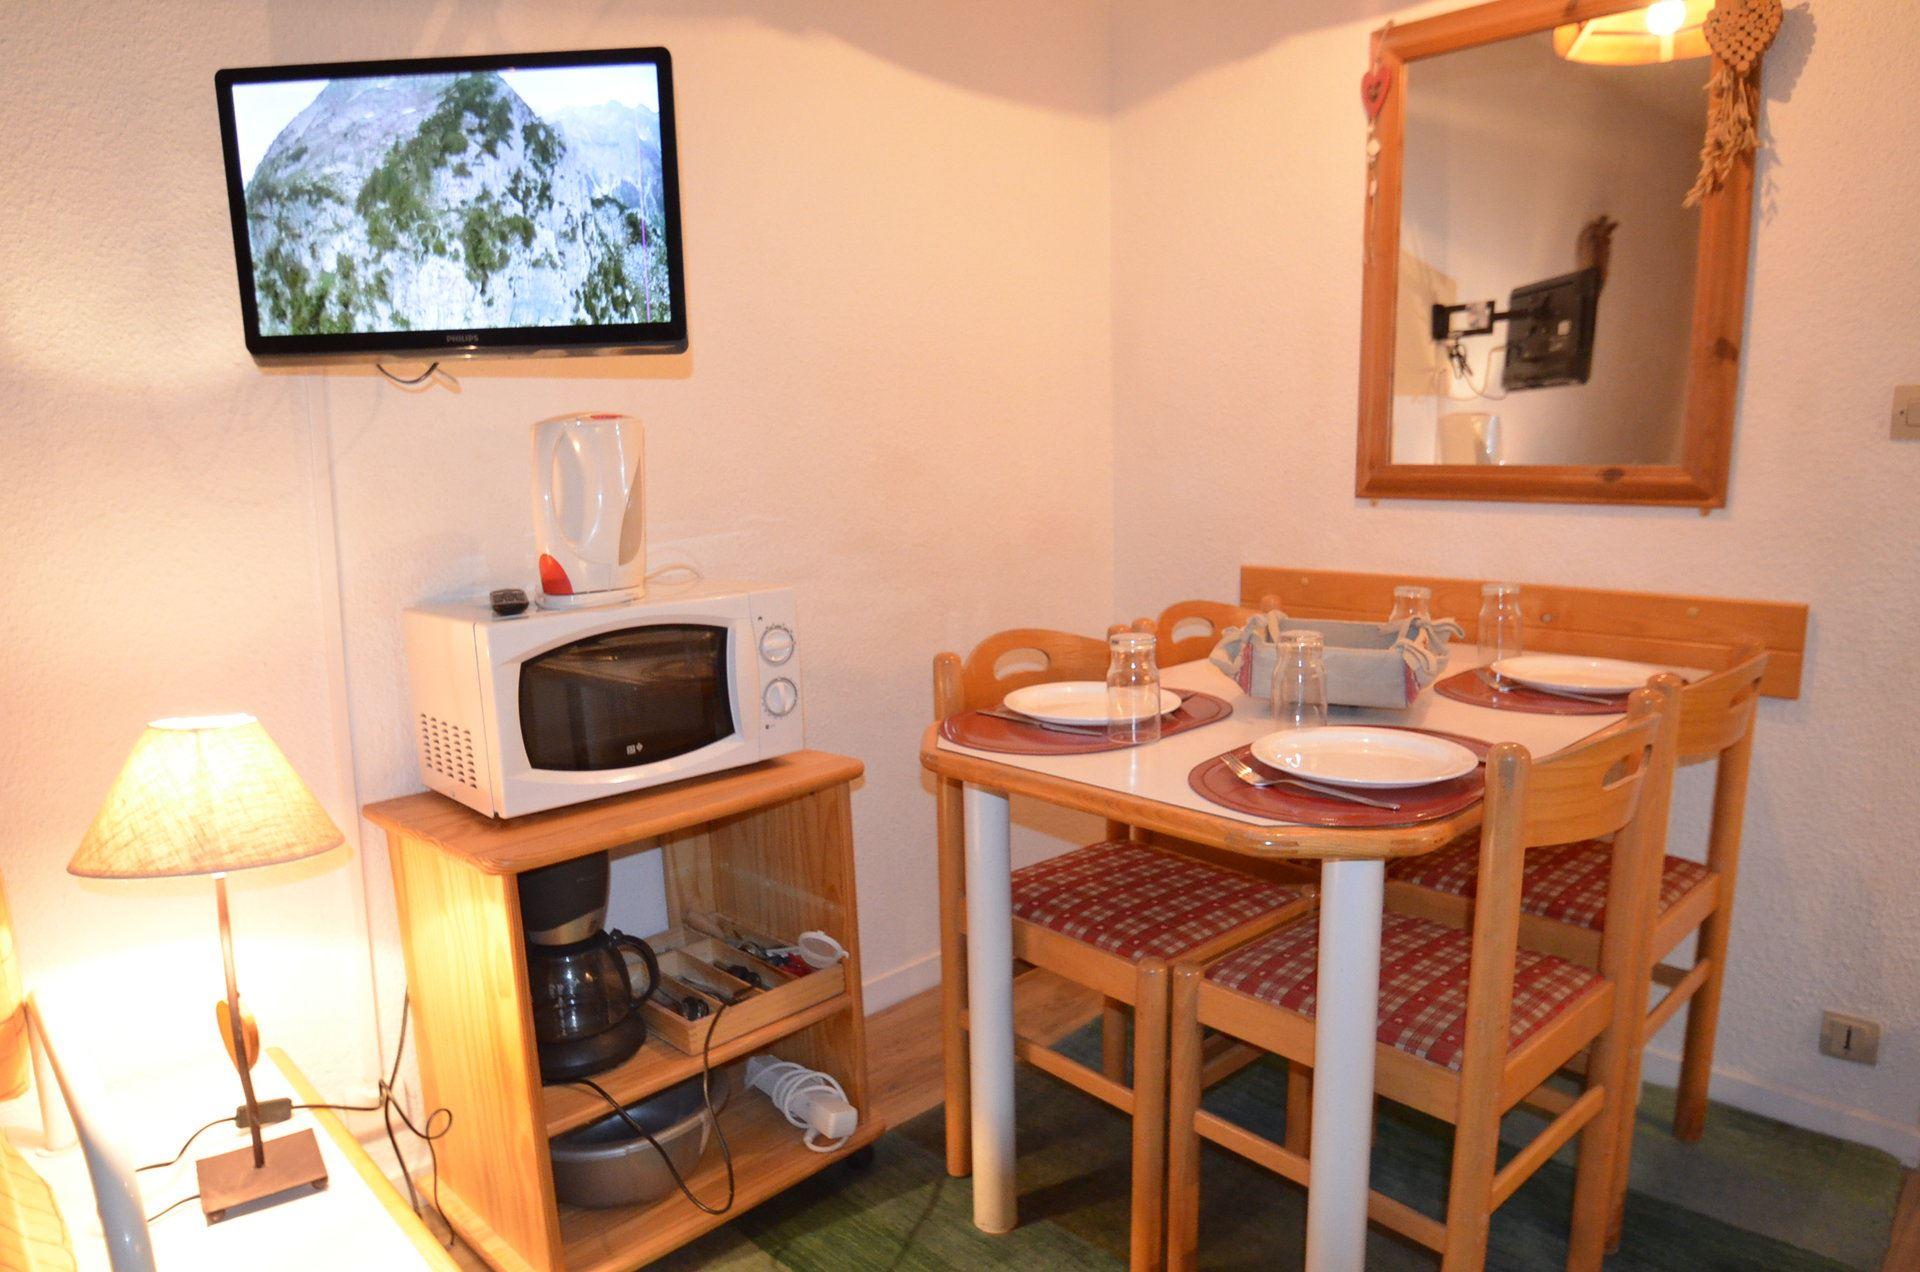 4 Pers cabin Studio ski-in ski-out / NECOU 820